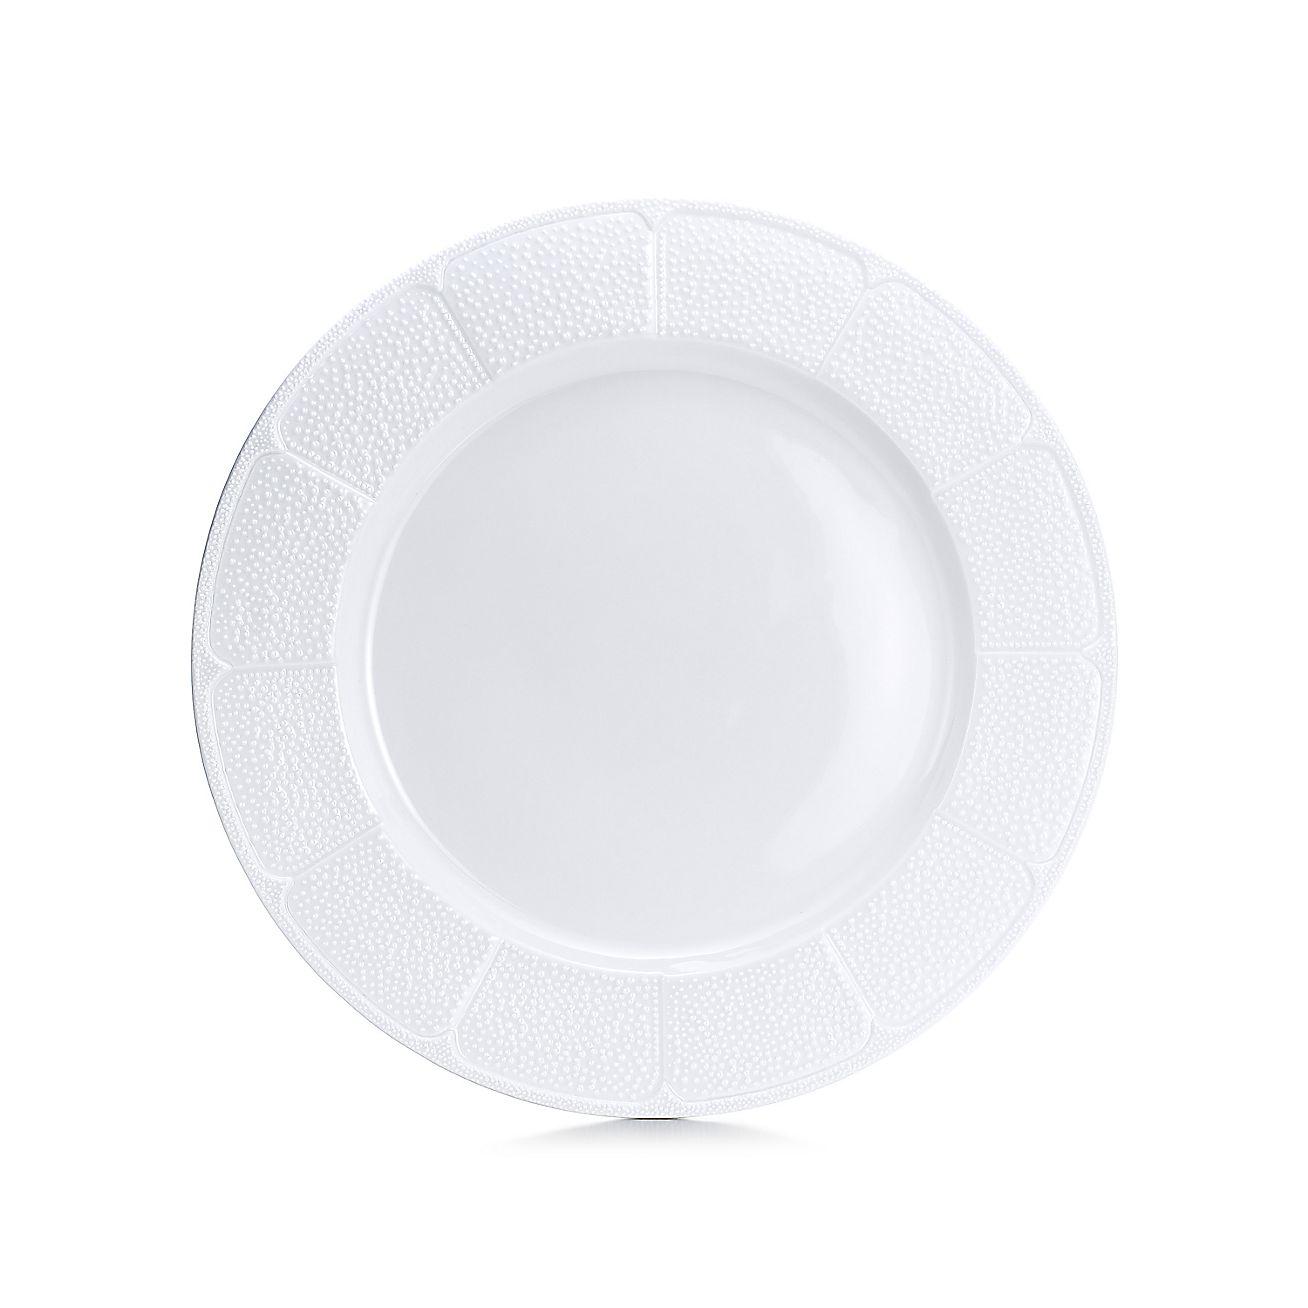 Sea Urchin:Platter